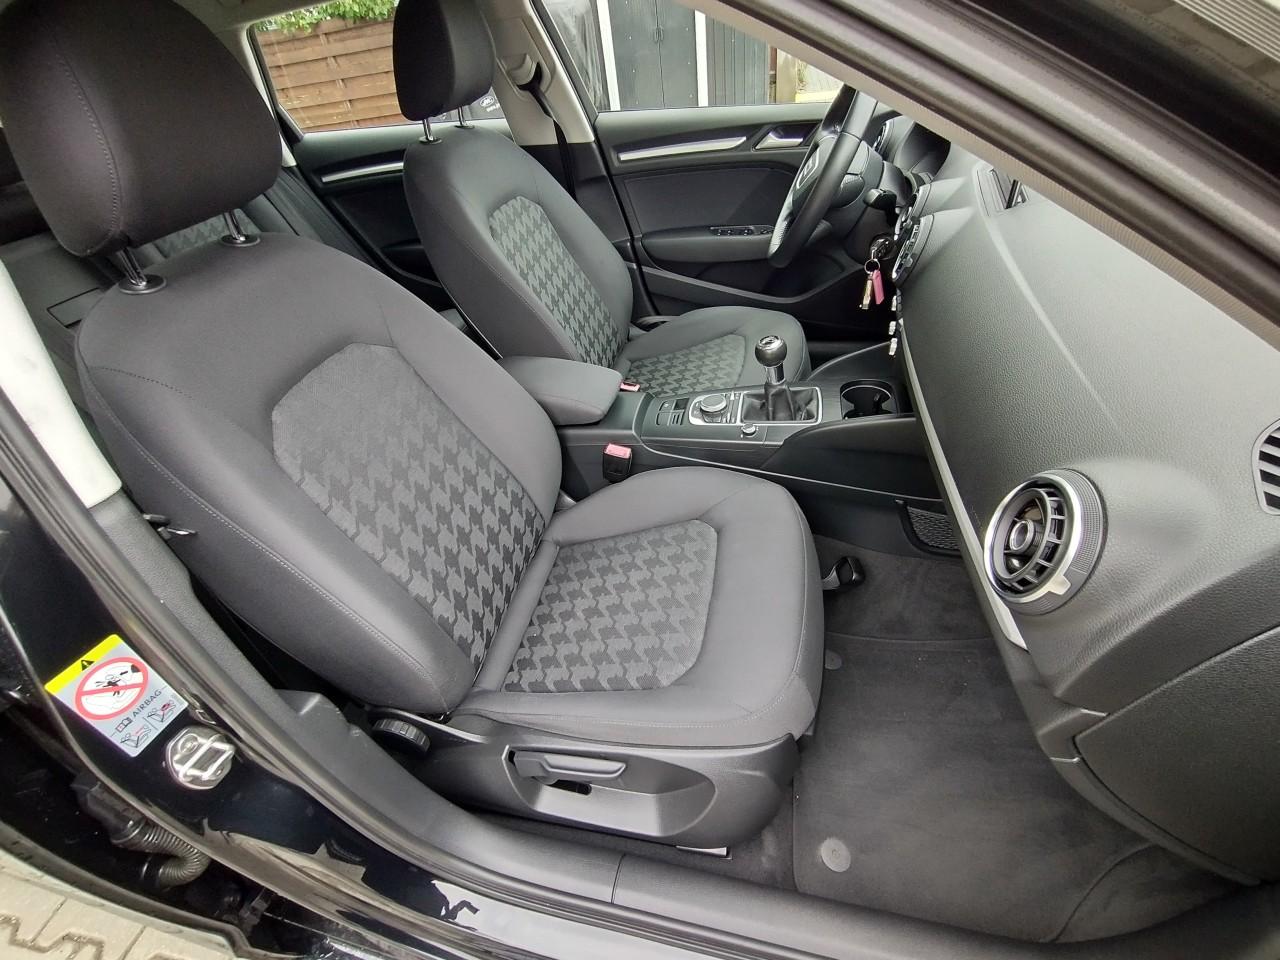 Audi A3 Euro 5 Navi - Full Options 2014